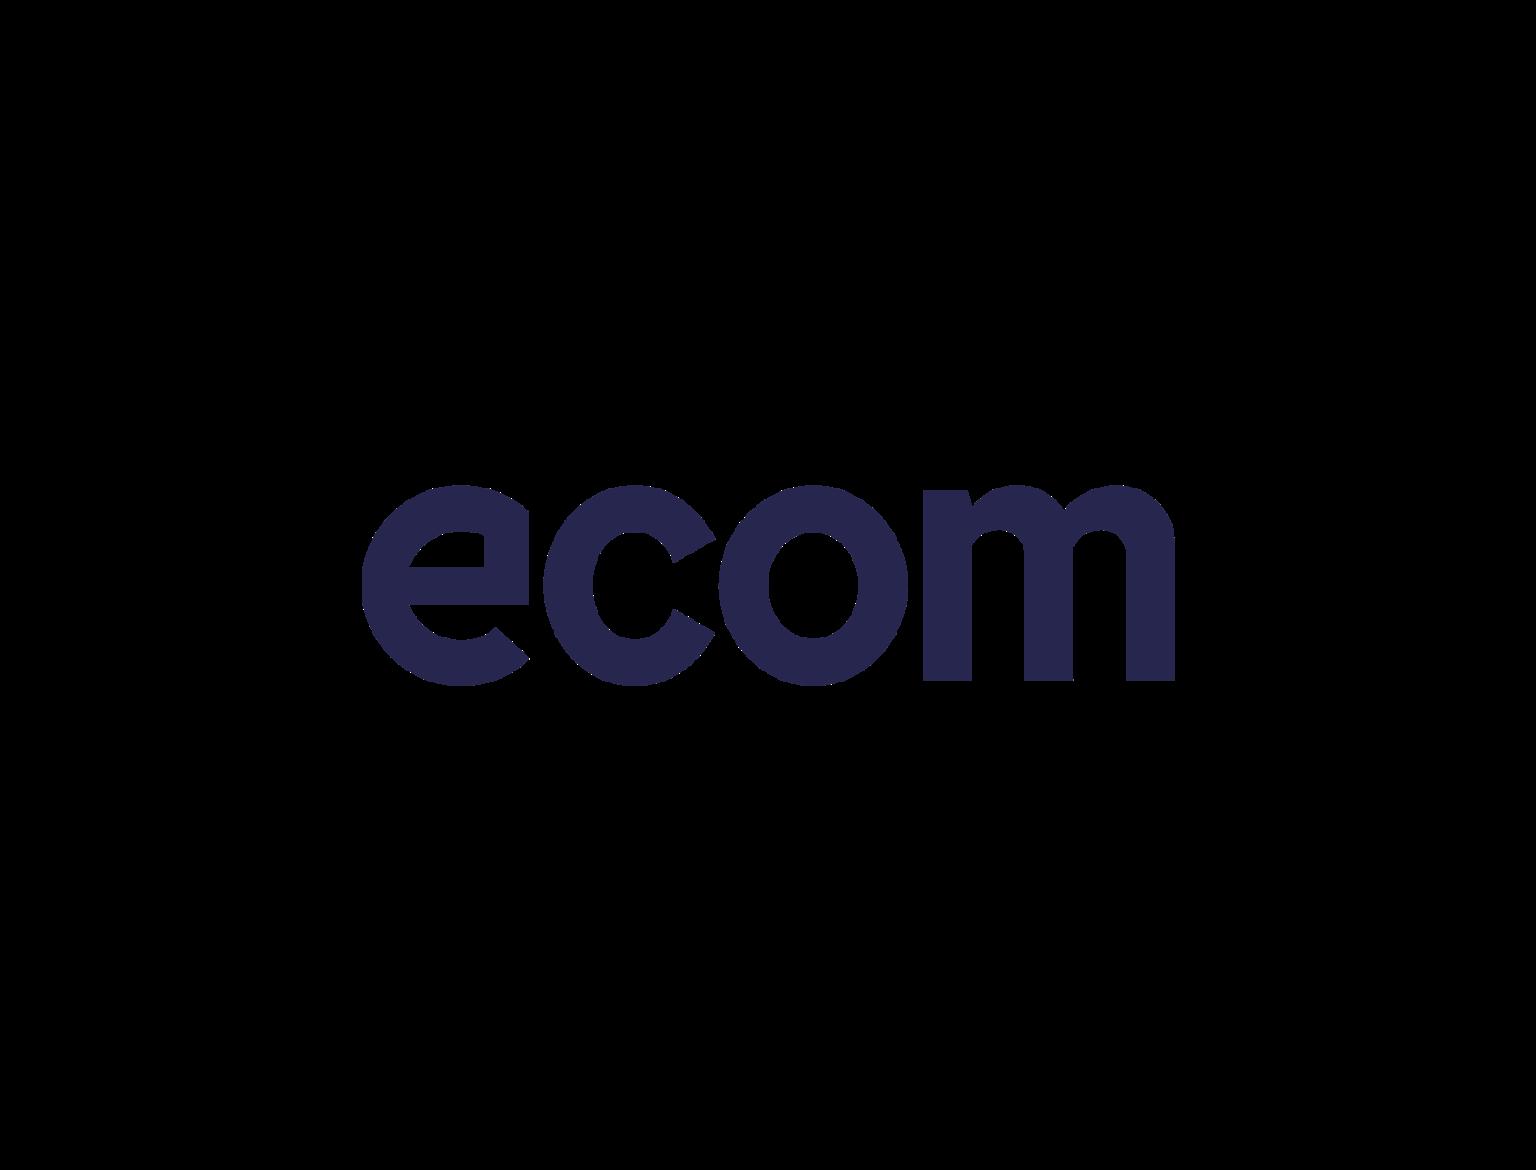 Ecom_logo-ilman-taustaa-1536x1170